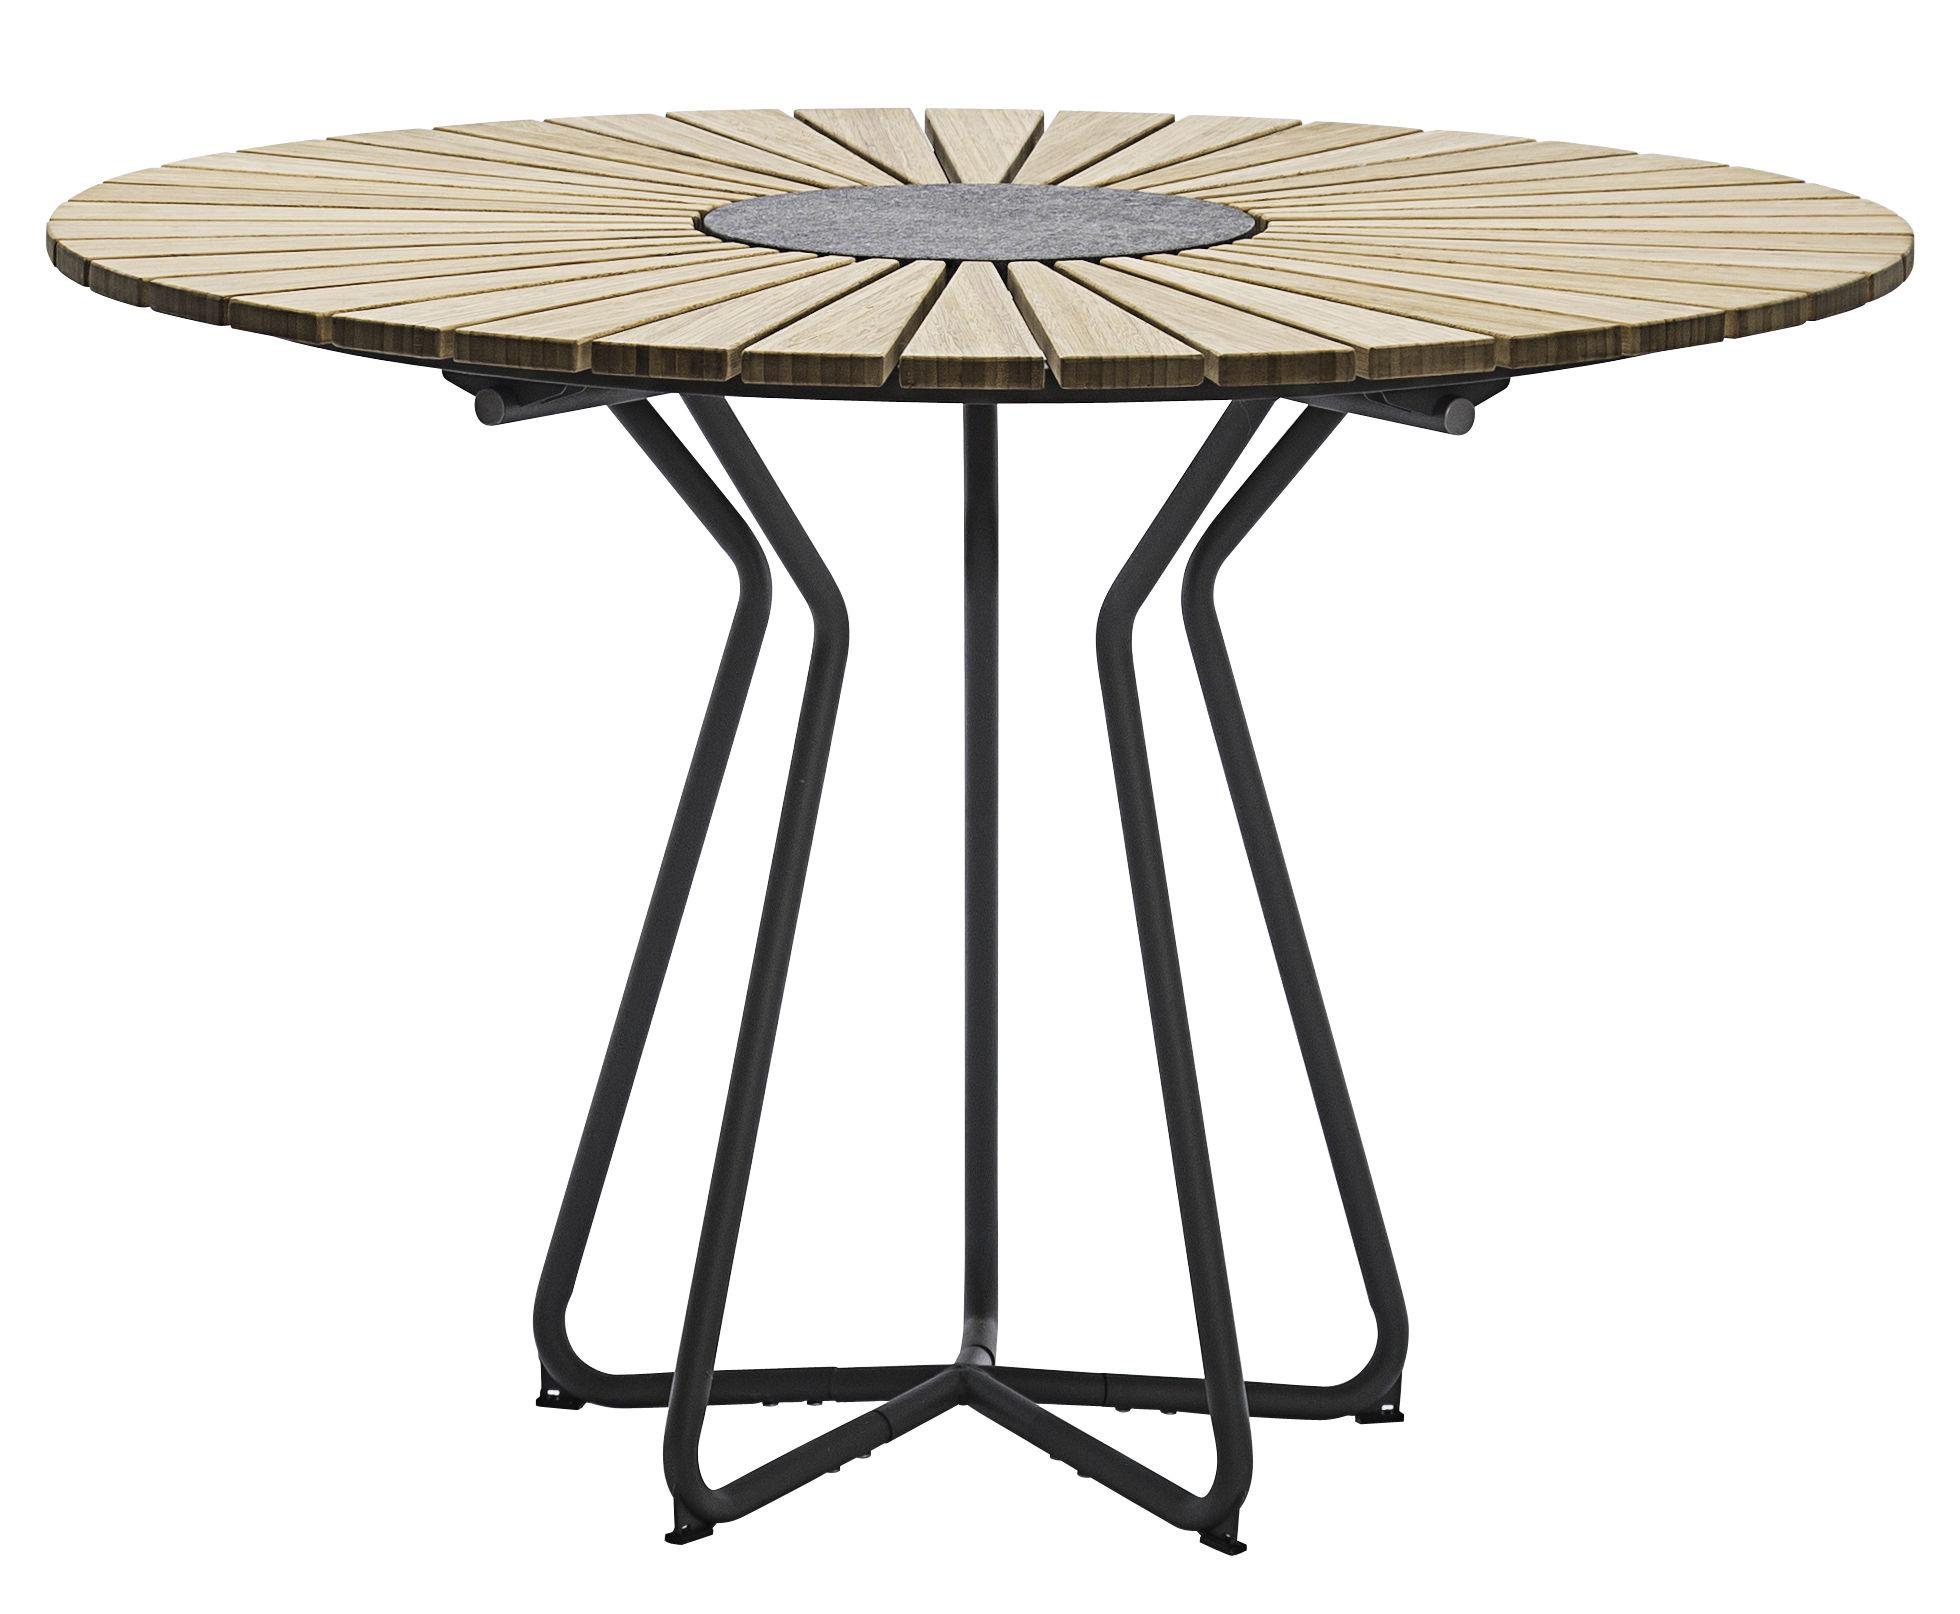 Outdoor - Tavoli  - Tavolo da giardino Circle /  Ø 110 cm - bambù & granito - Houe - Bambù / Base grigio - Bambù, Granito, Metallo rivestito in resina epossidica